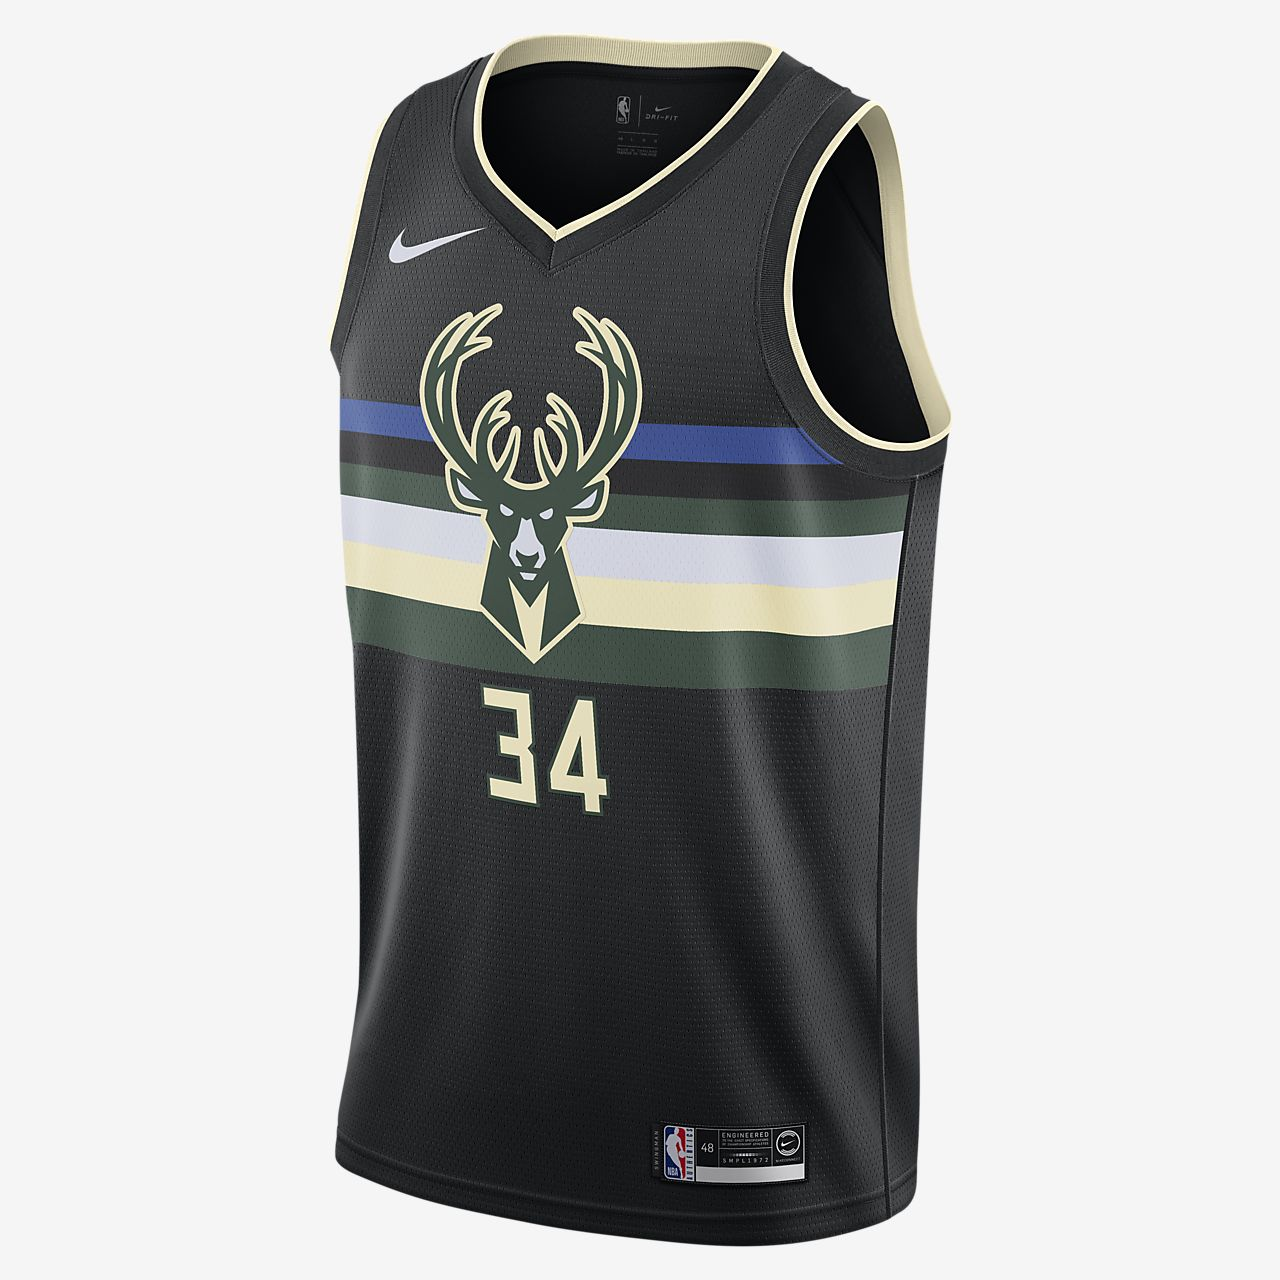 Camisola NBA da Nike Swingman Giannis Antetokounmpo Bucks Statement Edition